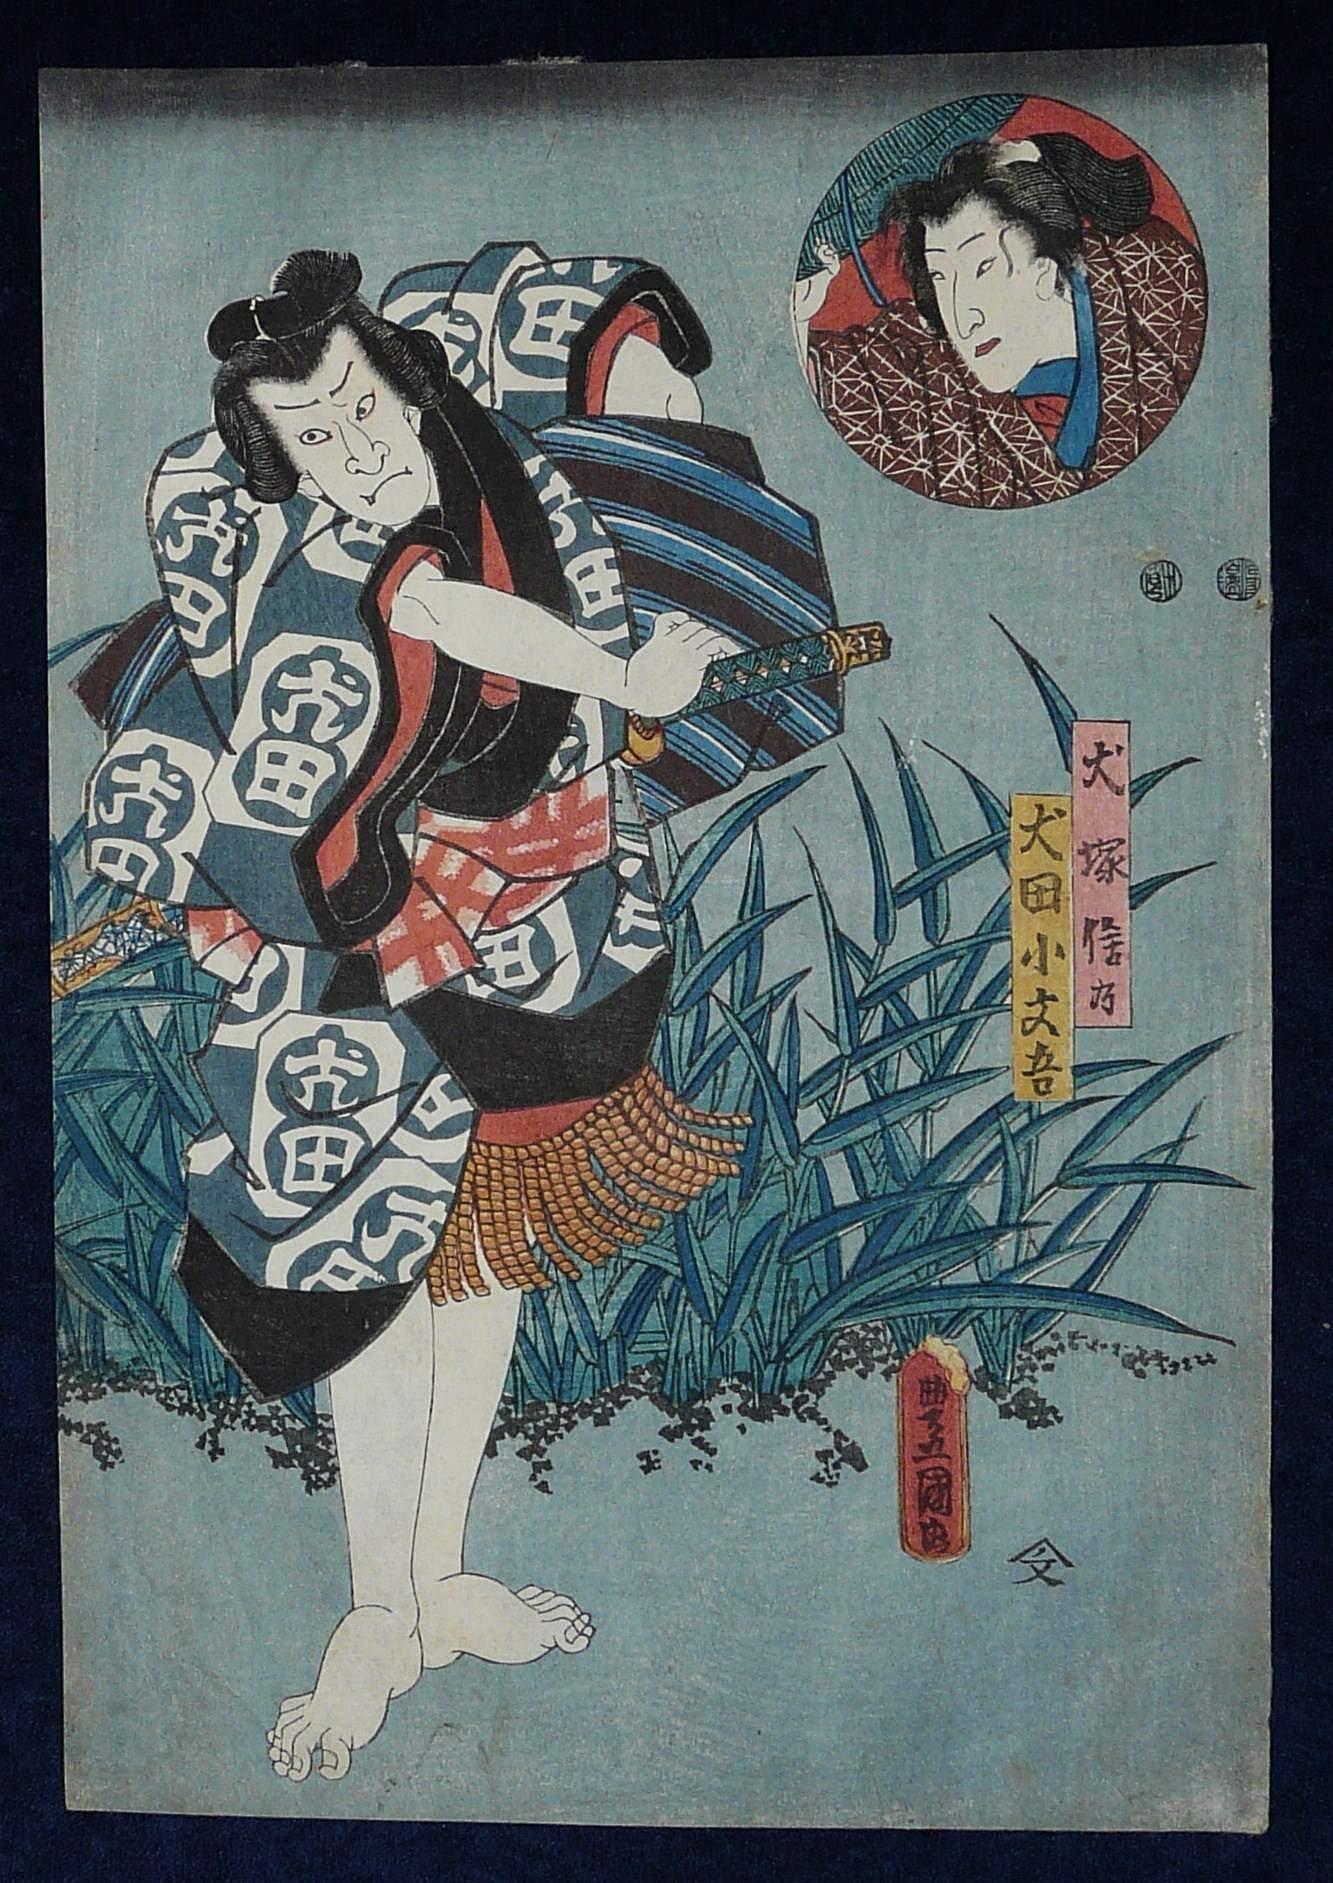 UTAGAWA KUNISADA: #P3865 EARLY SAMURAI WITH ROUND PORTRAIT DATED 1847 To 1853